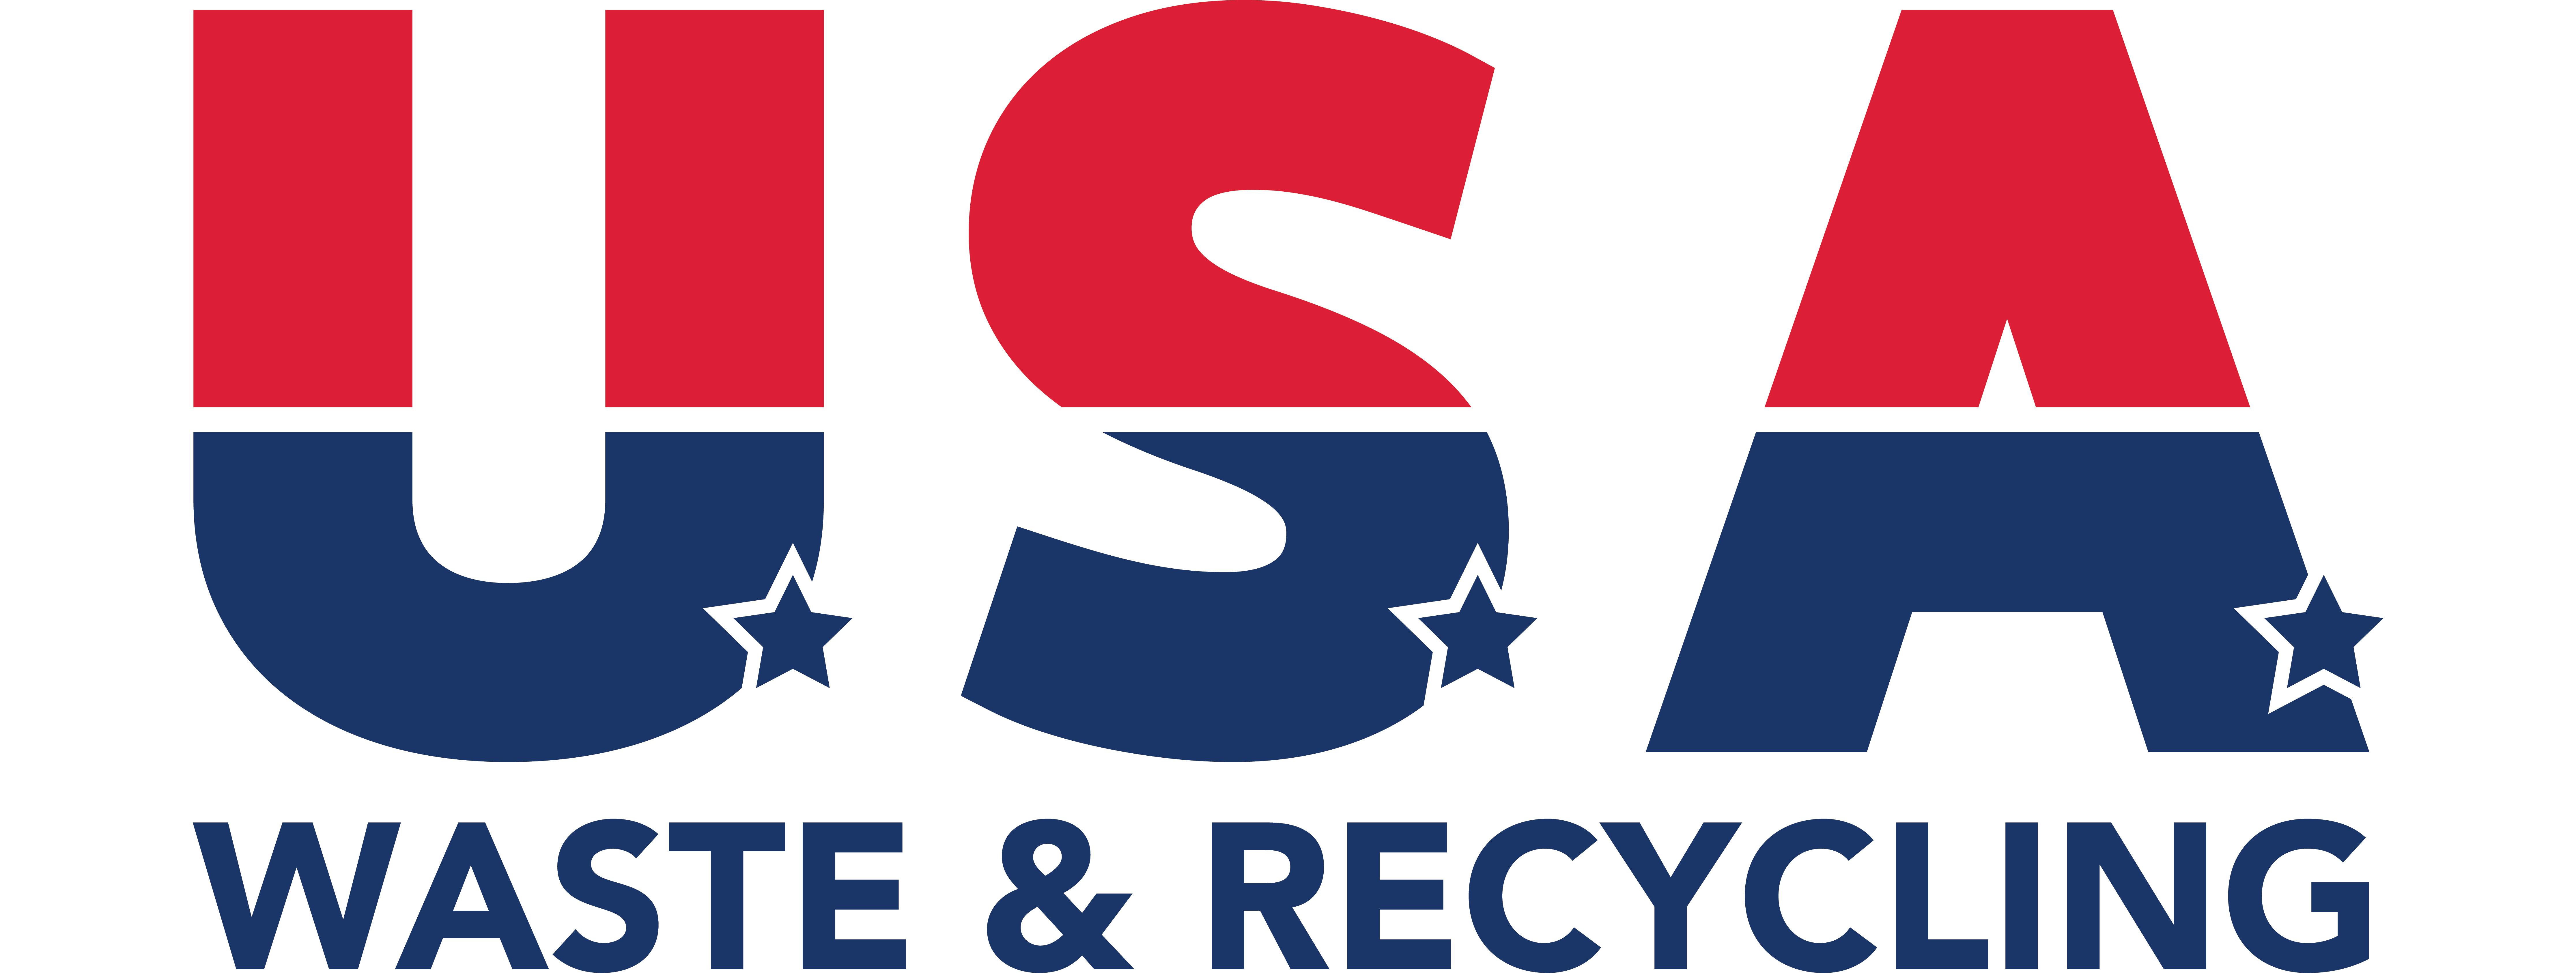 usa waste logo 2142x809-01